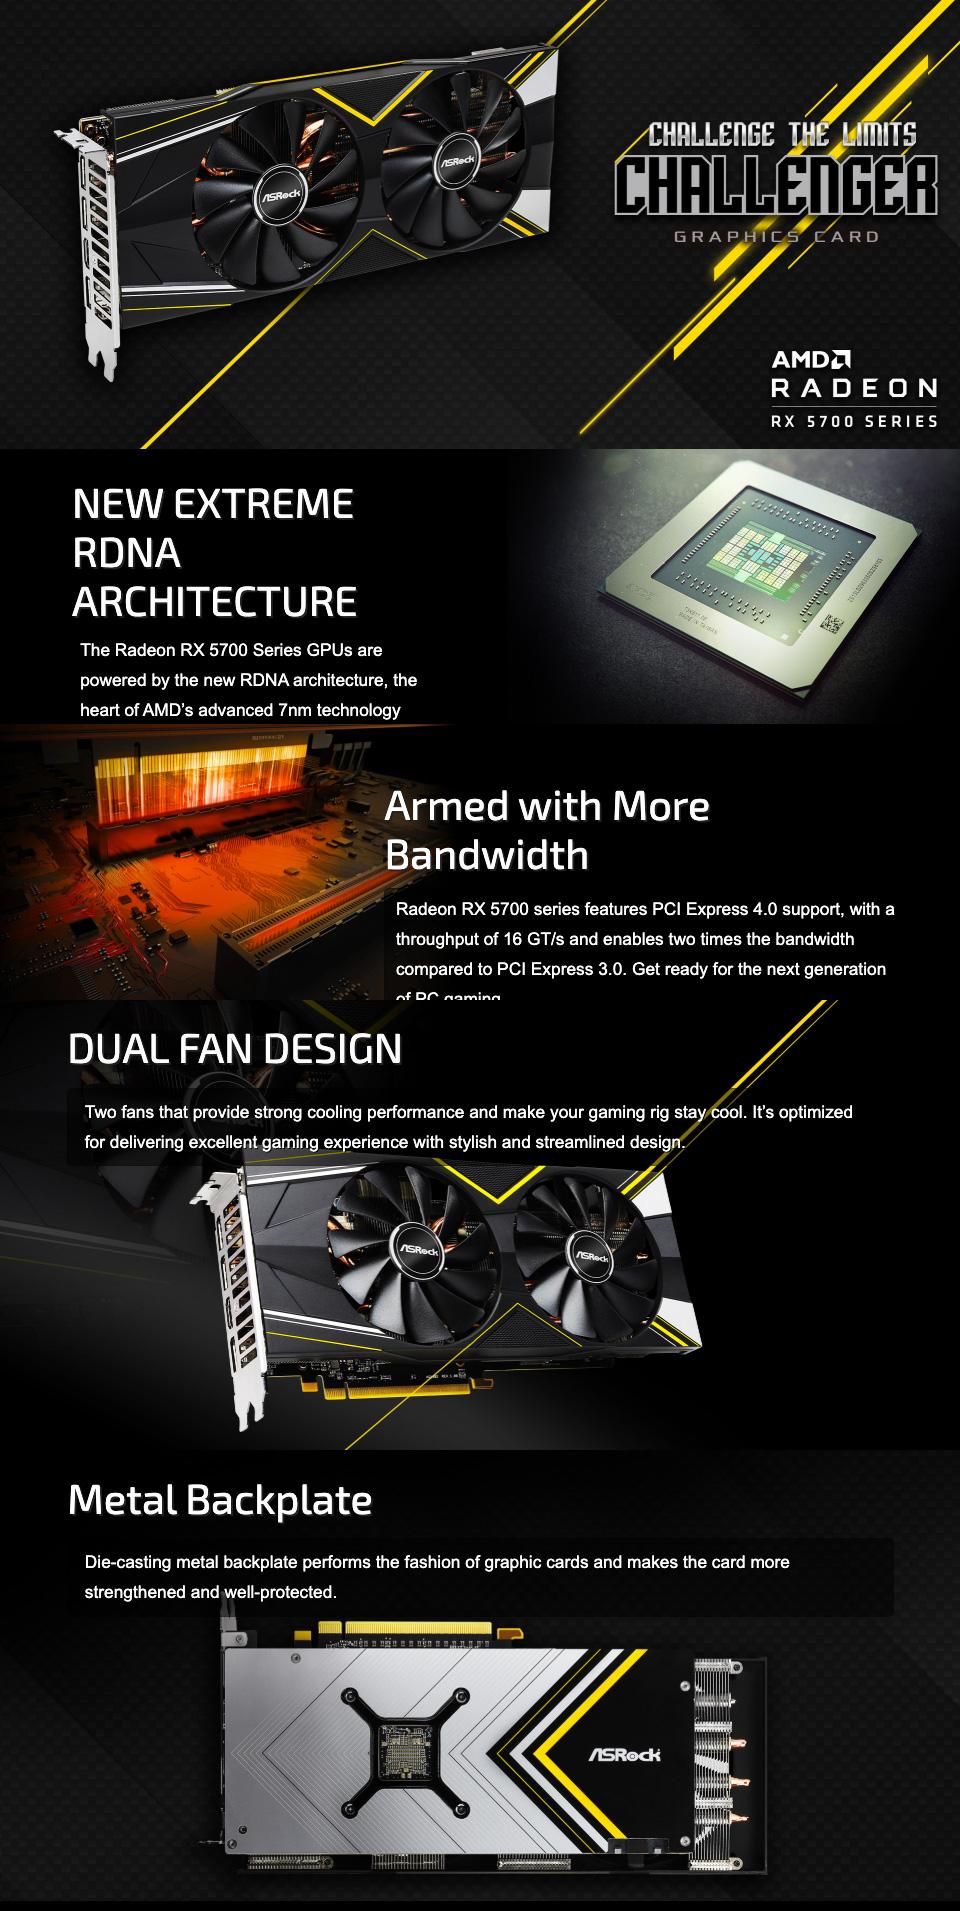 ASRock Challenger D Radeon RX 5700 XT 8GB features